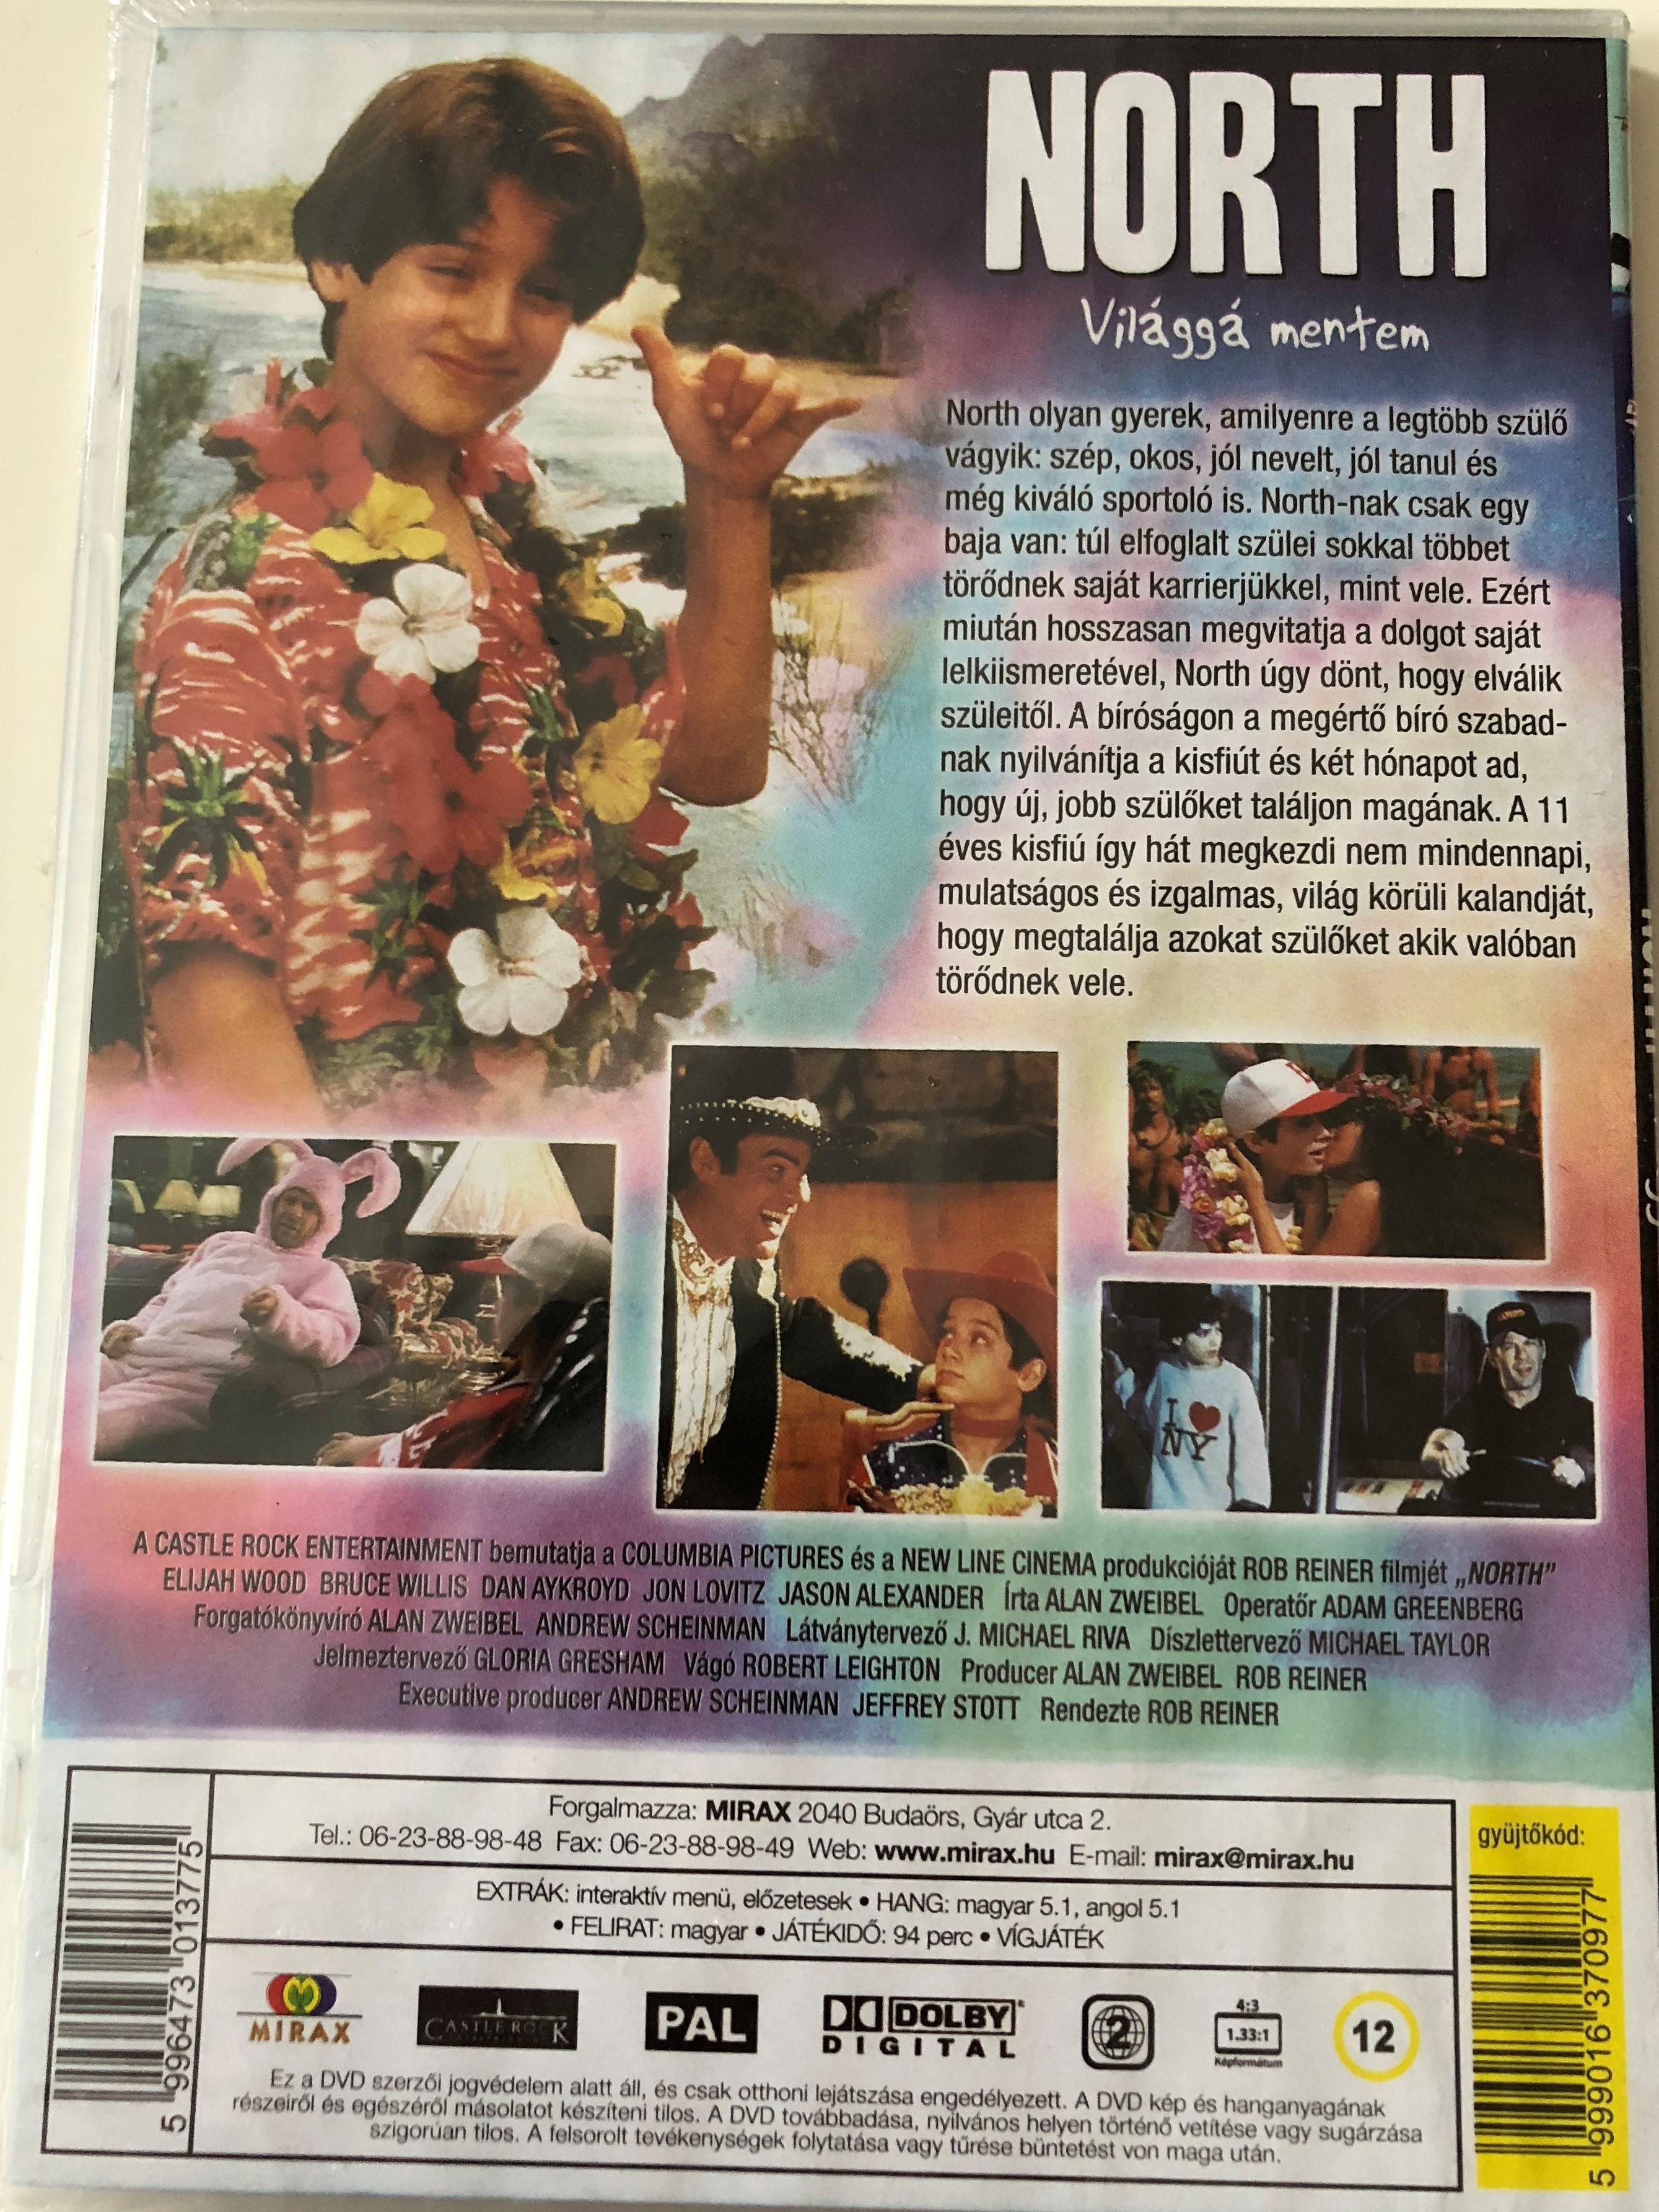 vil-gg-mentem-dvd-1994-north-directed-by-rob-reiner-starring-elijah-wood-bruce-willis-dan-aykroyd-jon-lovitz-2-.jpg